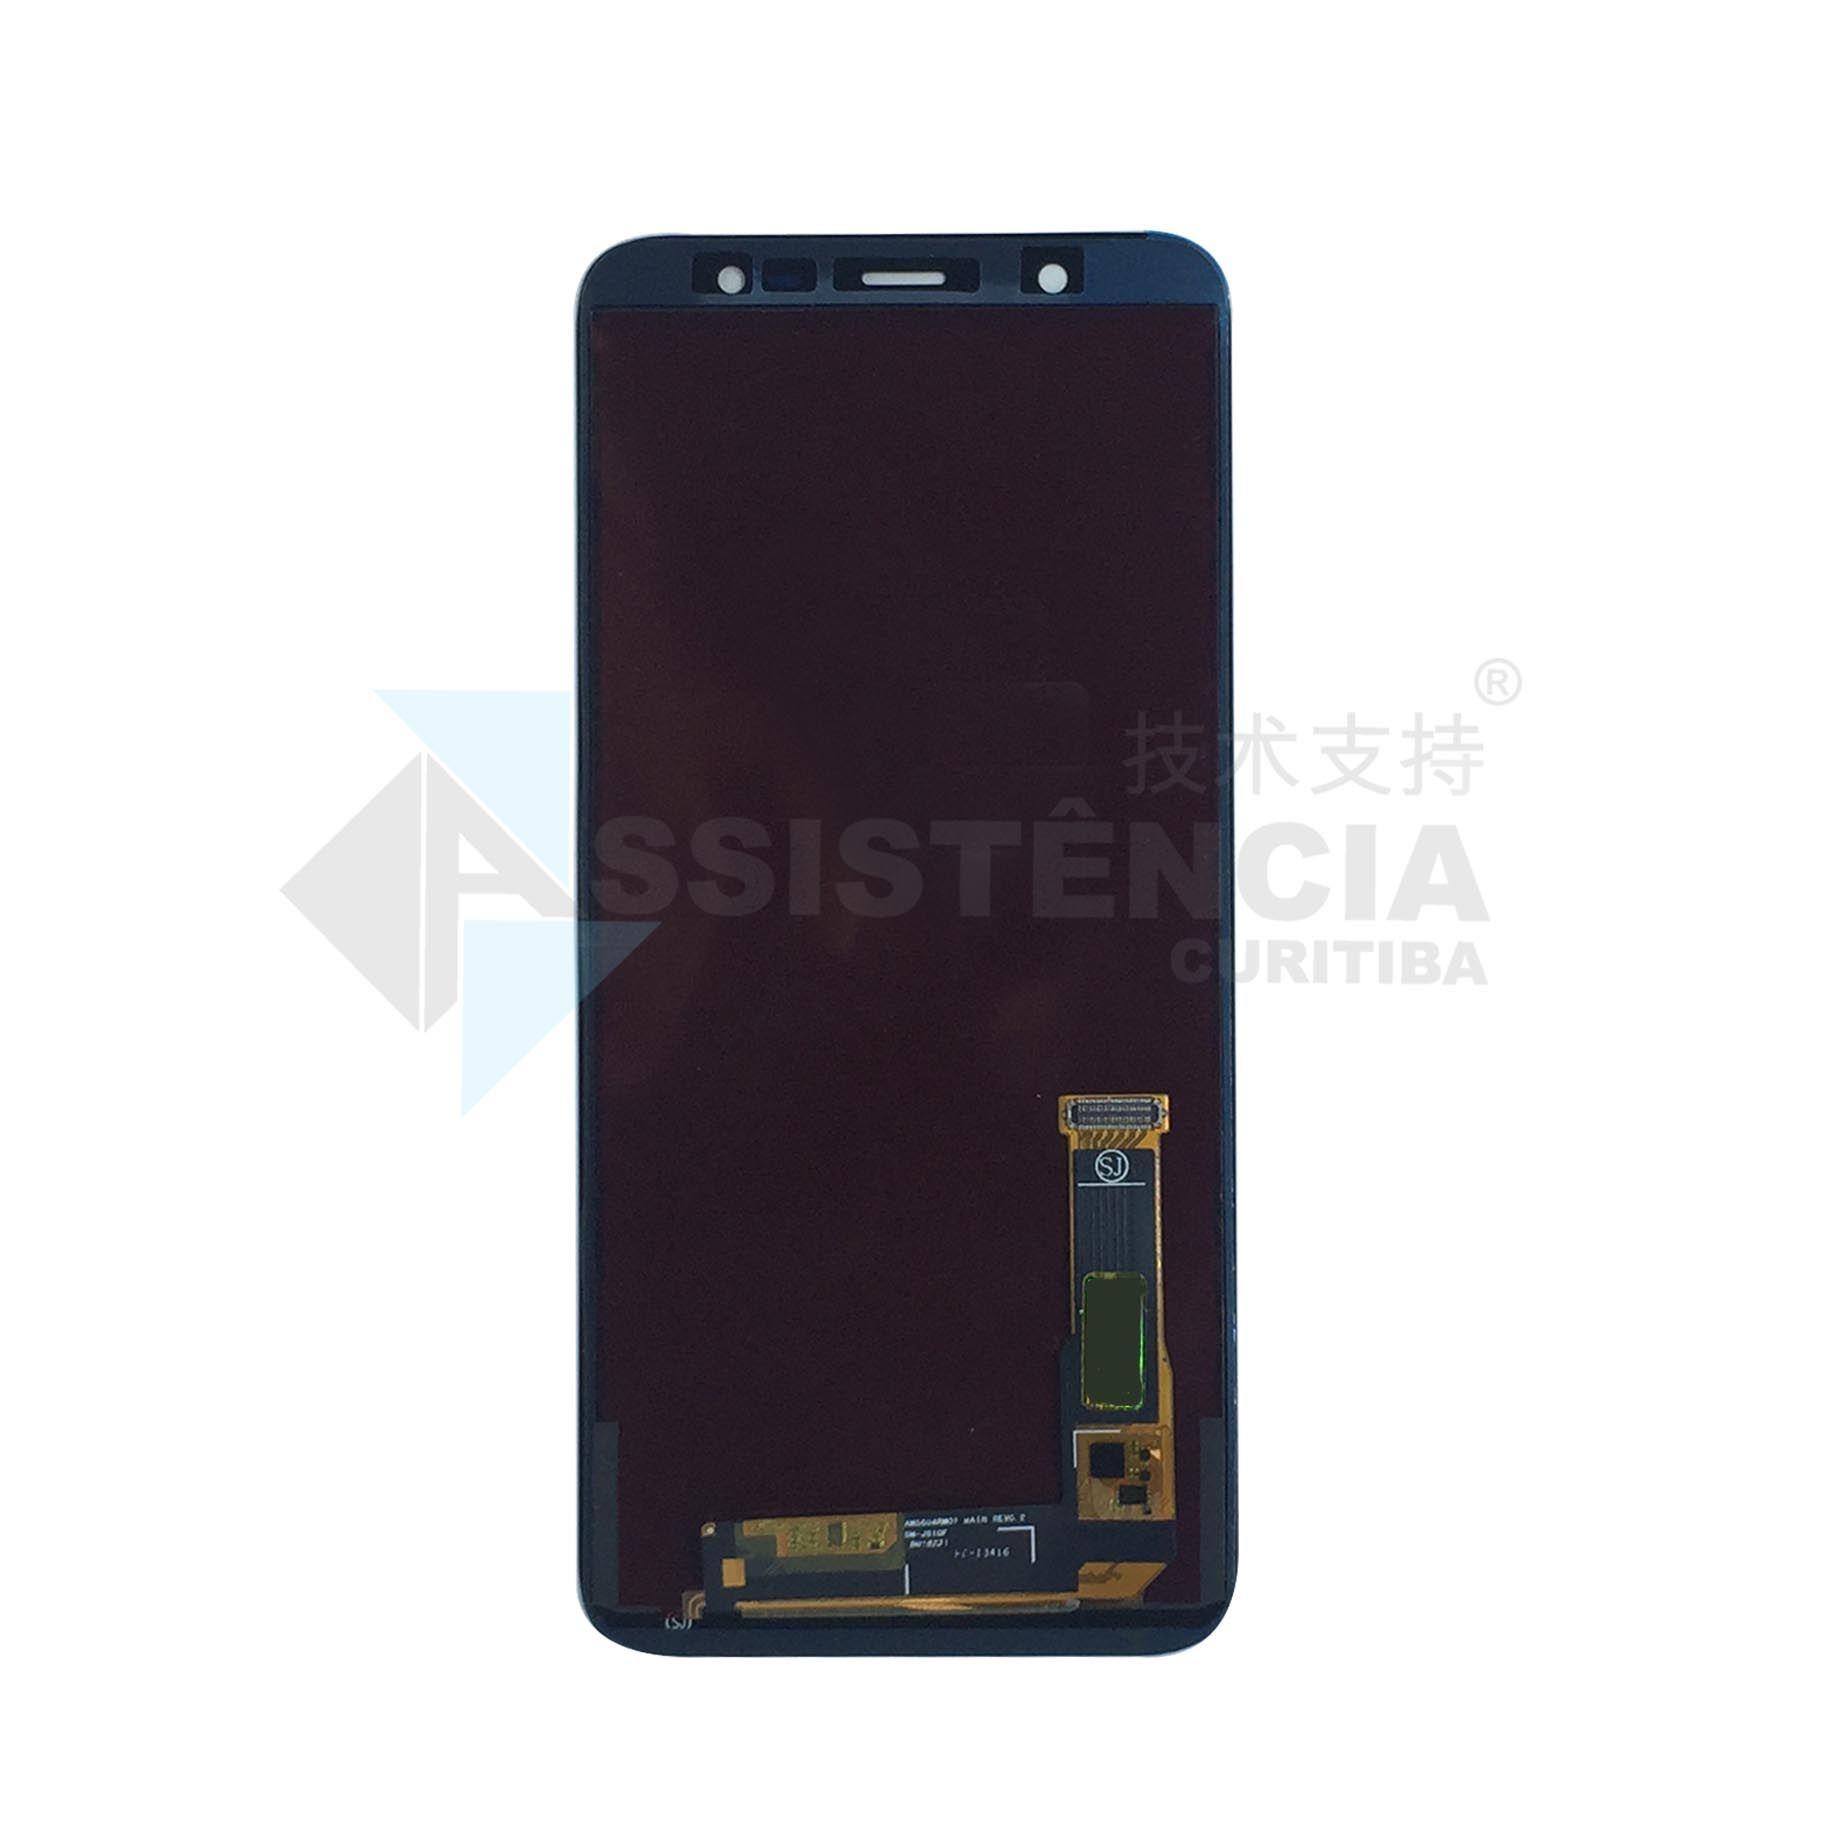 Tela Display Samsung Galaxy J8 J810 Original Ch